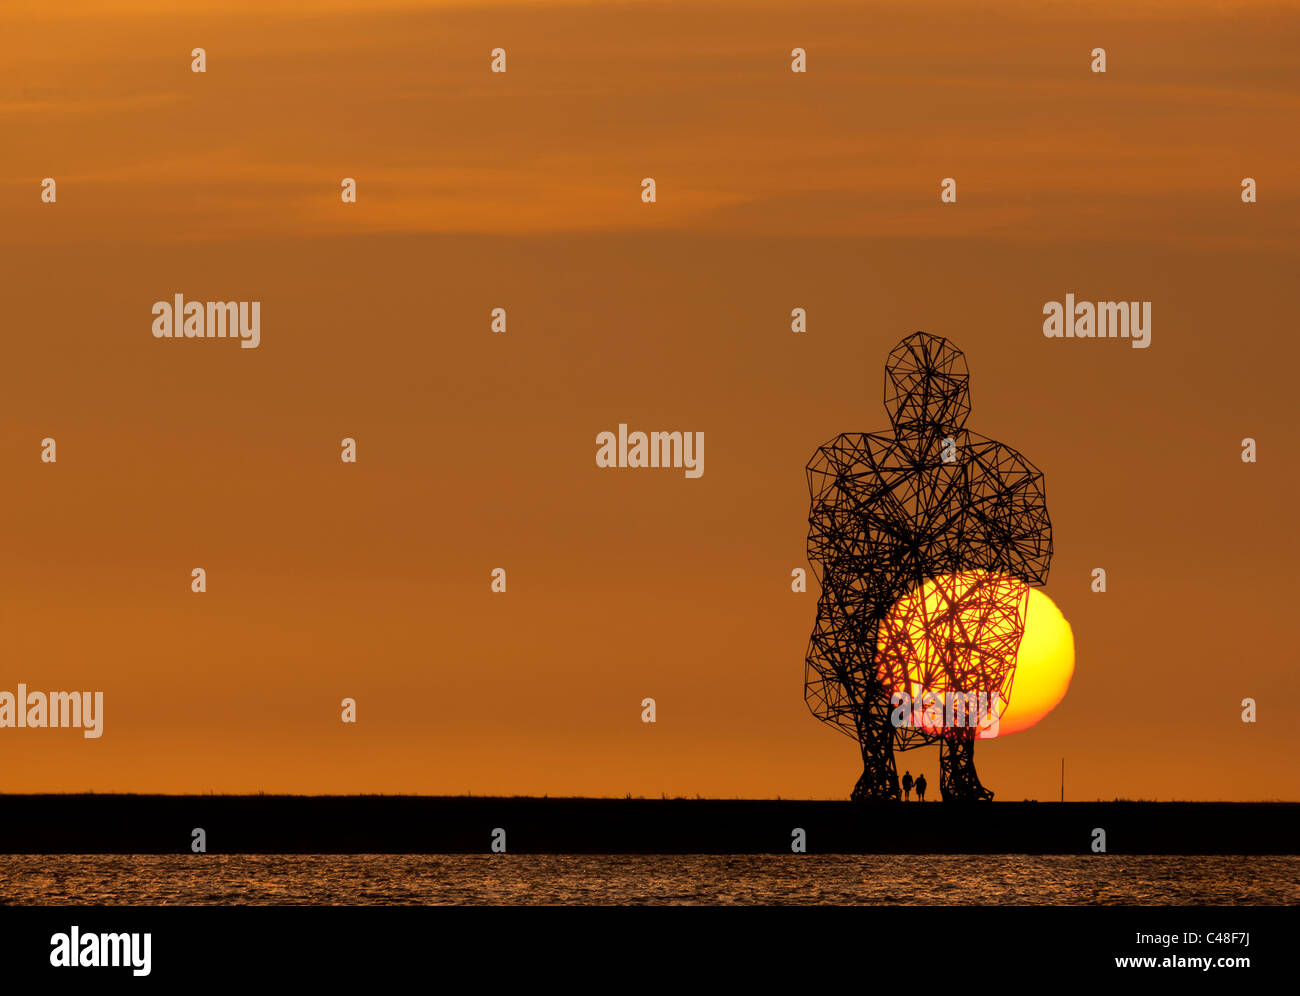 https://c7.alamy.com/comp/C48F7J/antony-gormley-exposure-with-sunset-looking-out-over-the-ijsselmeer-C48F7J.jpg